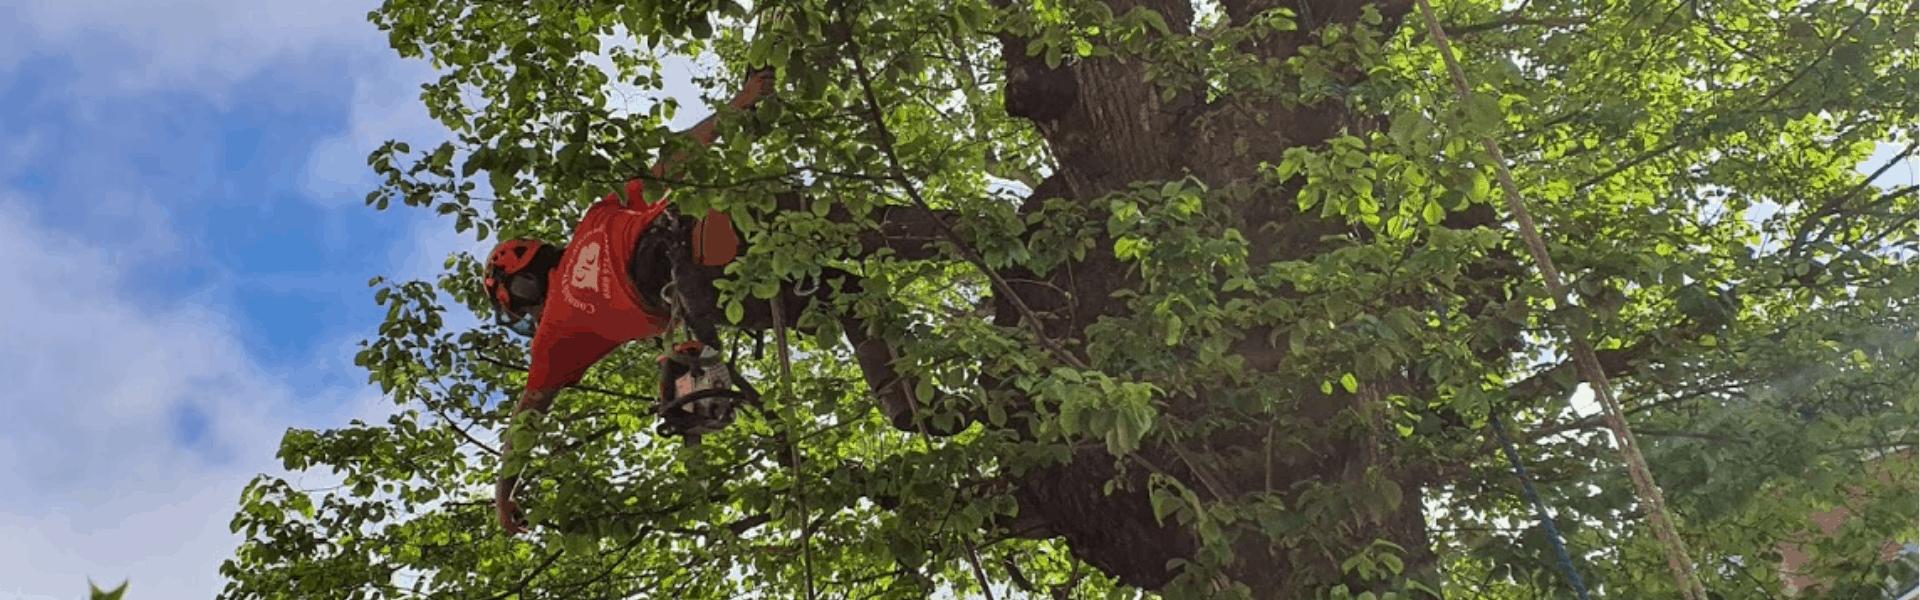 Climbing Arborist Surrey